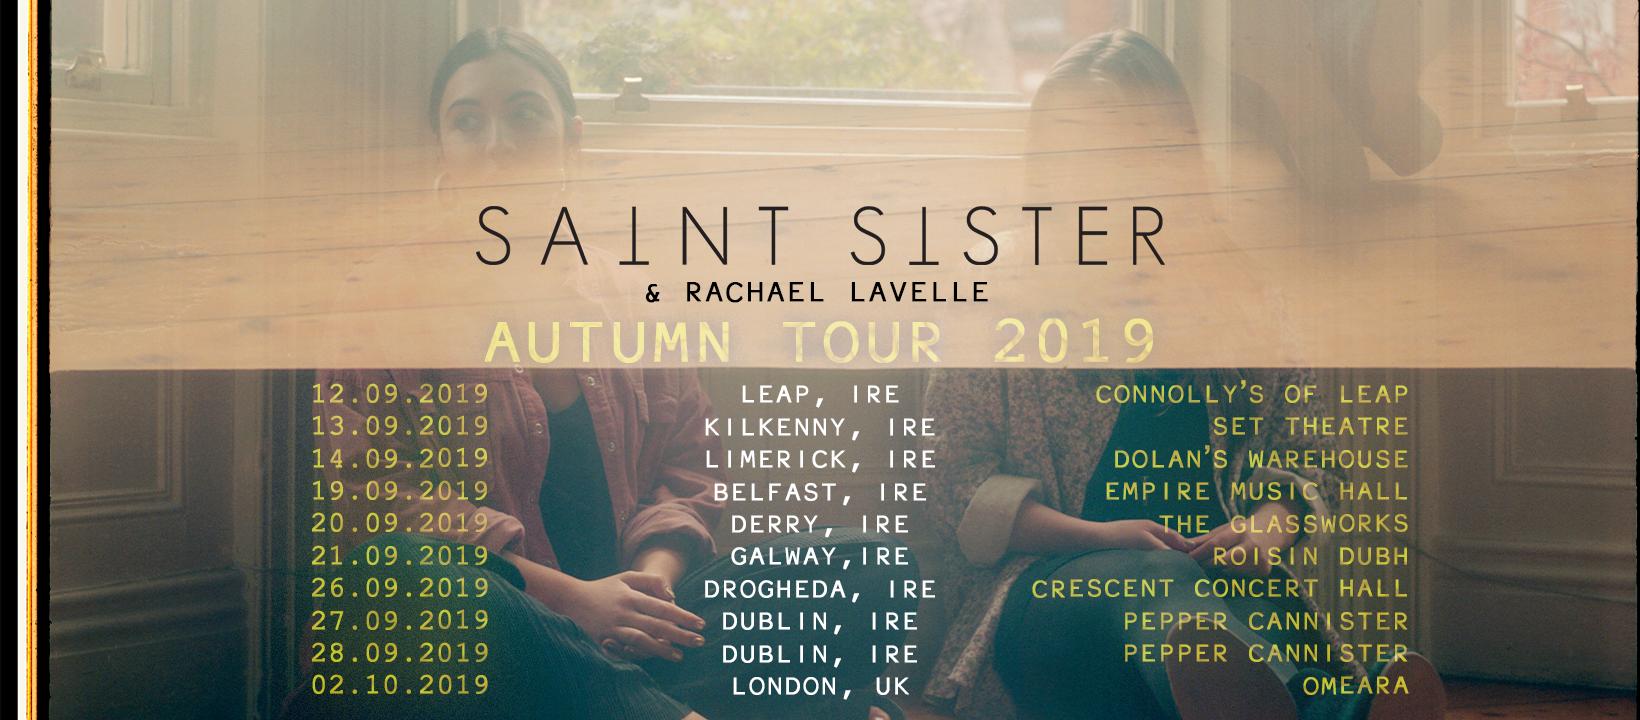 Saint Sister tour with Rachael Lavelle (1).png